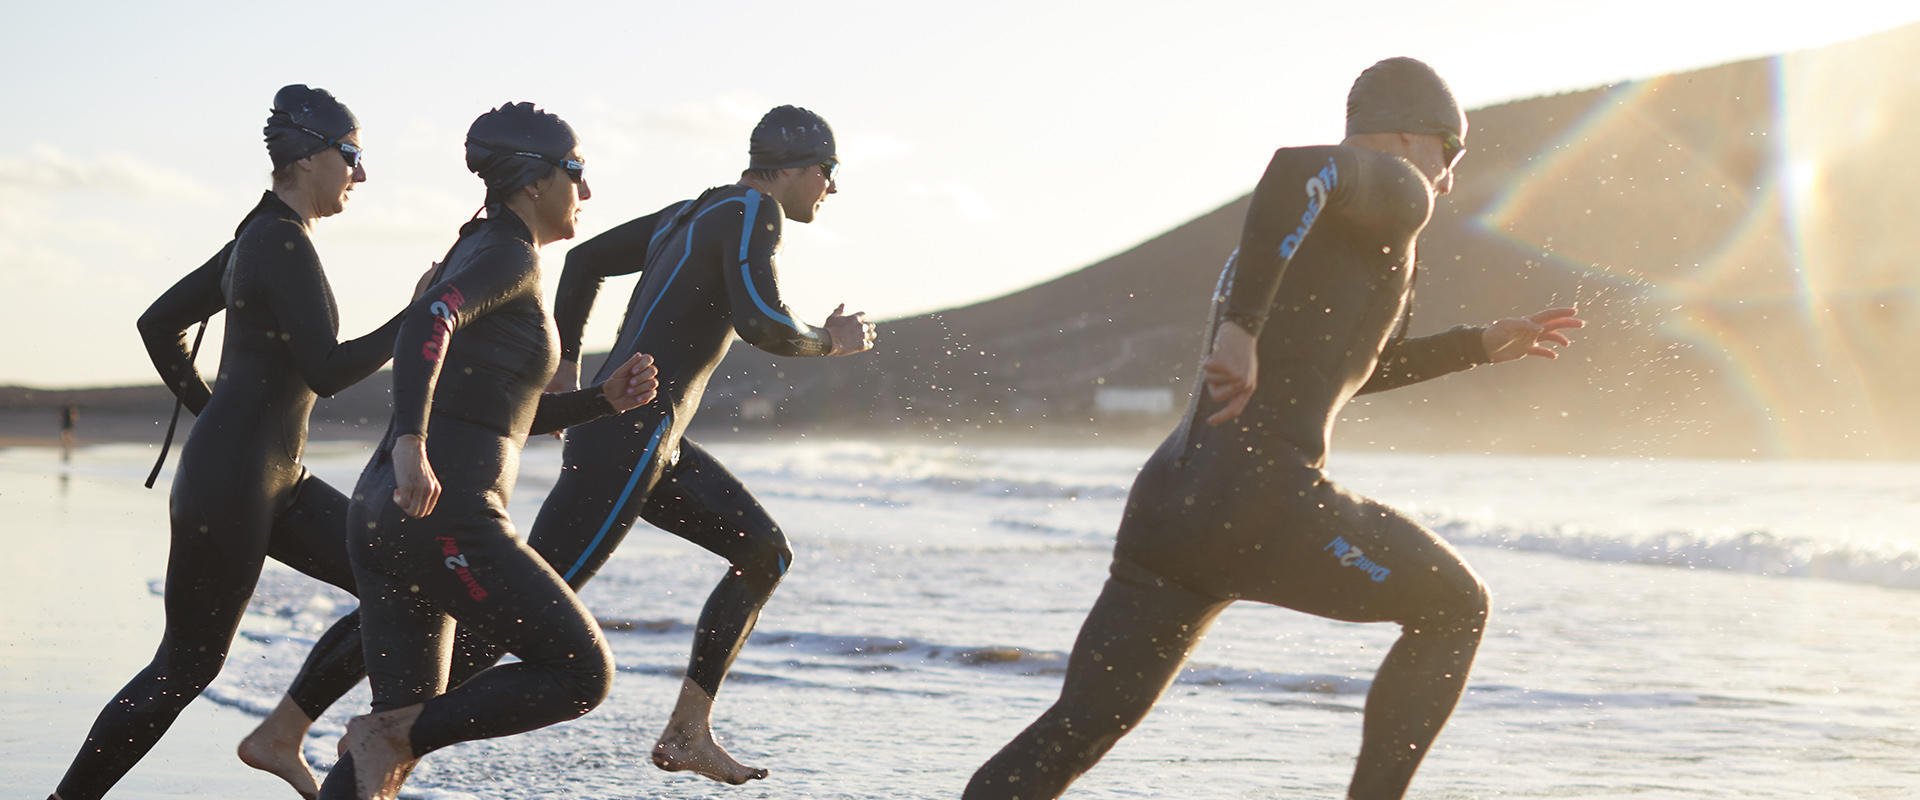 natation-depart-triathlon